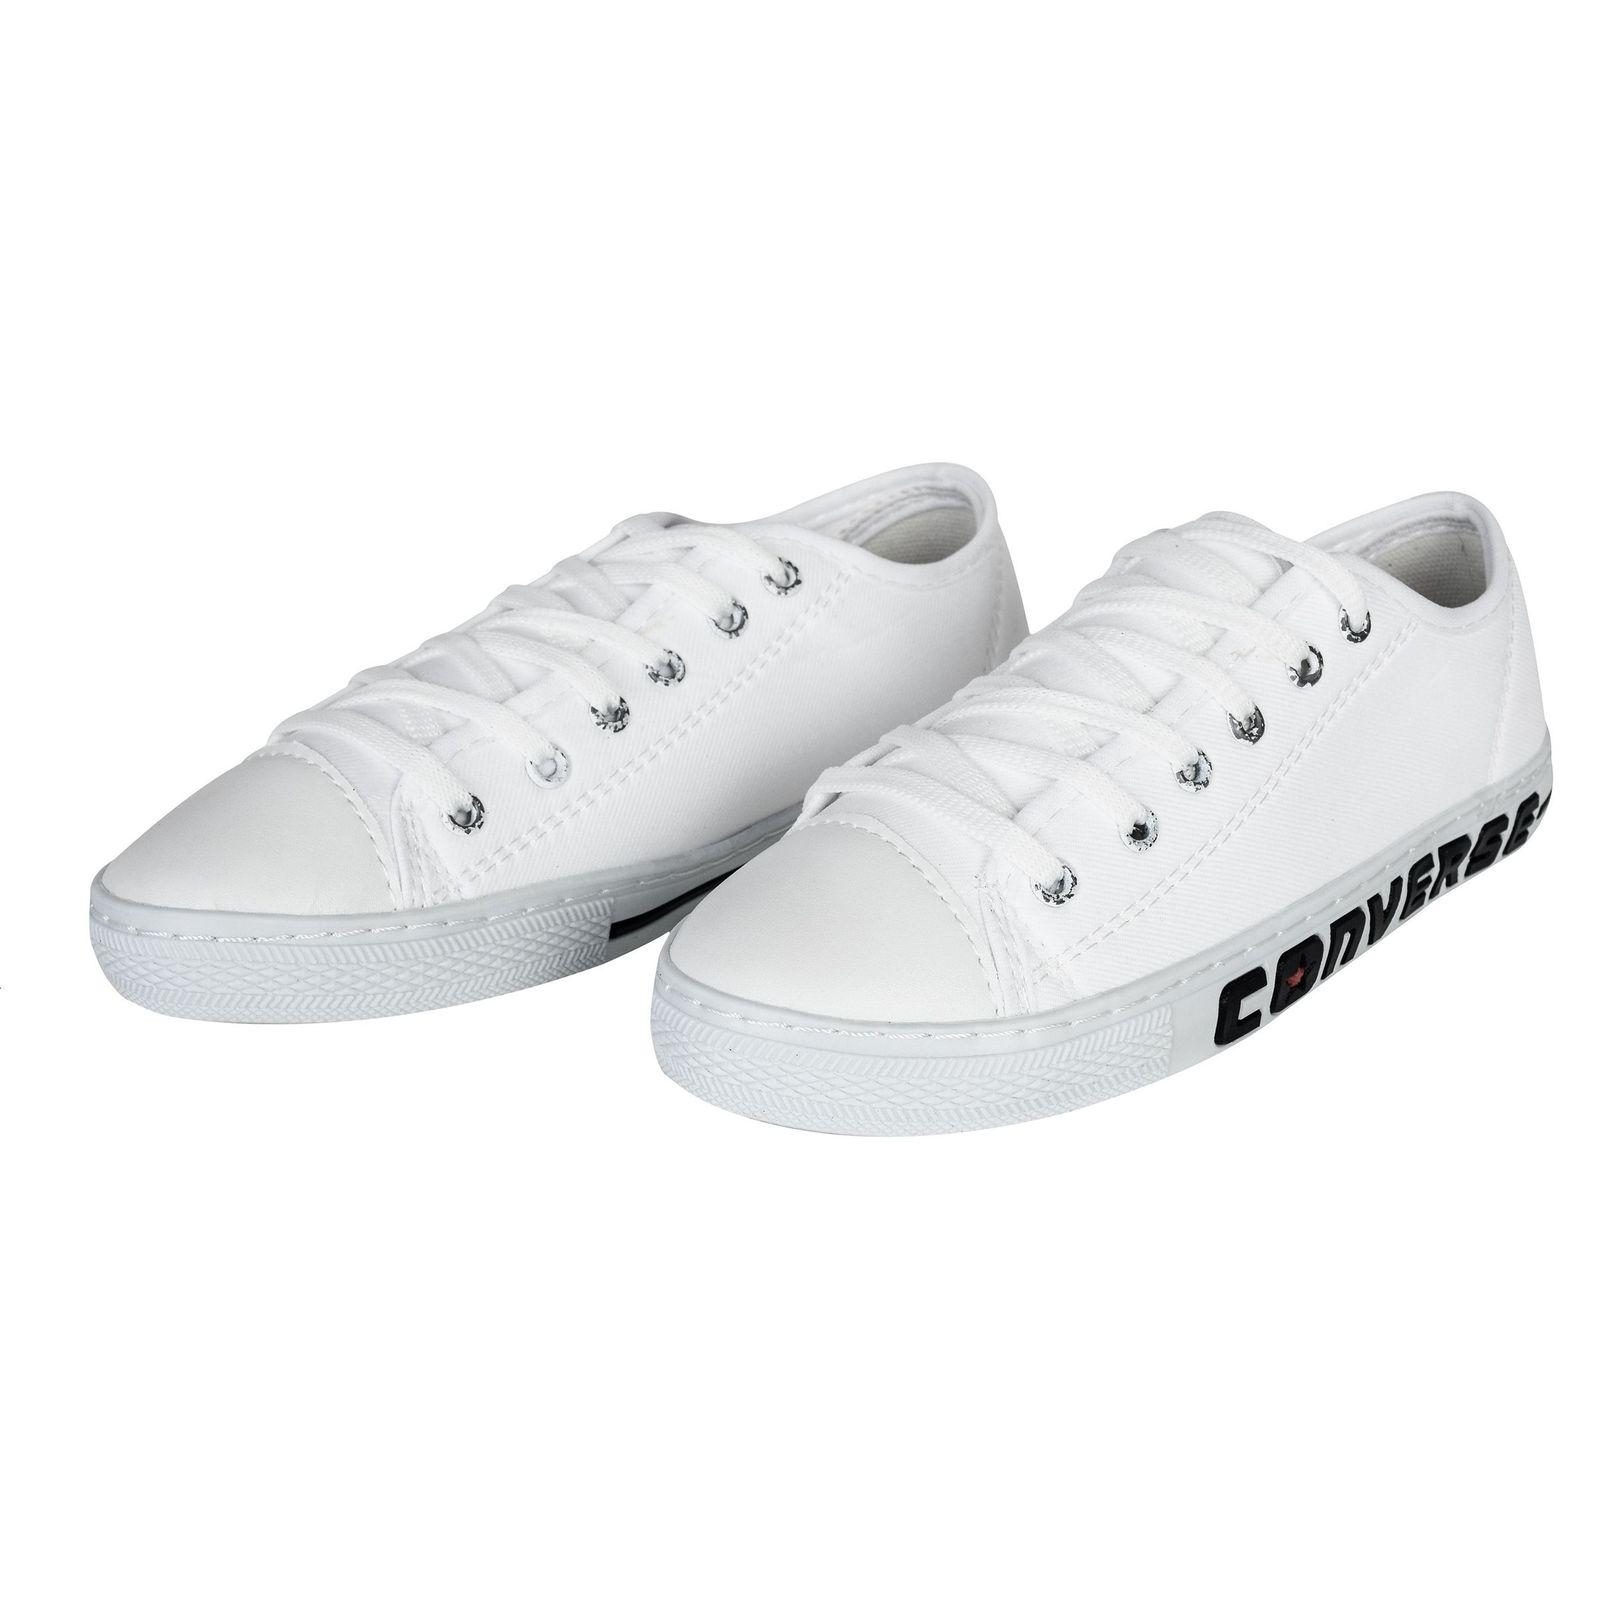 کفش راحتی زنانه کد H3 main 1 1